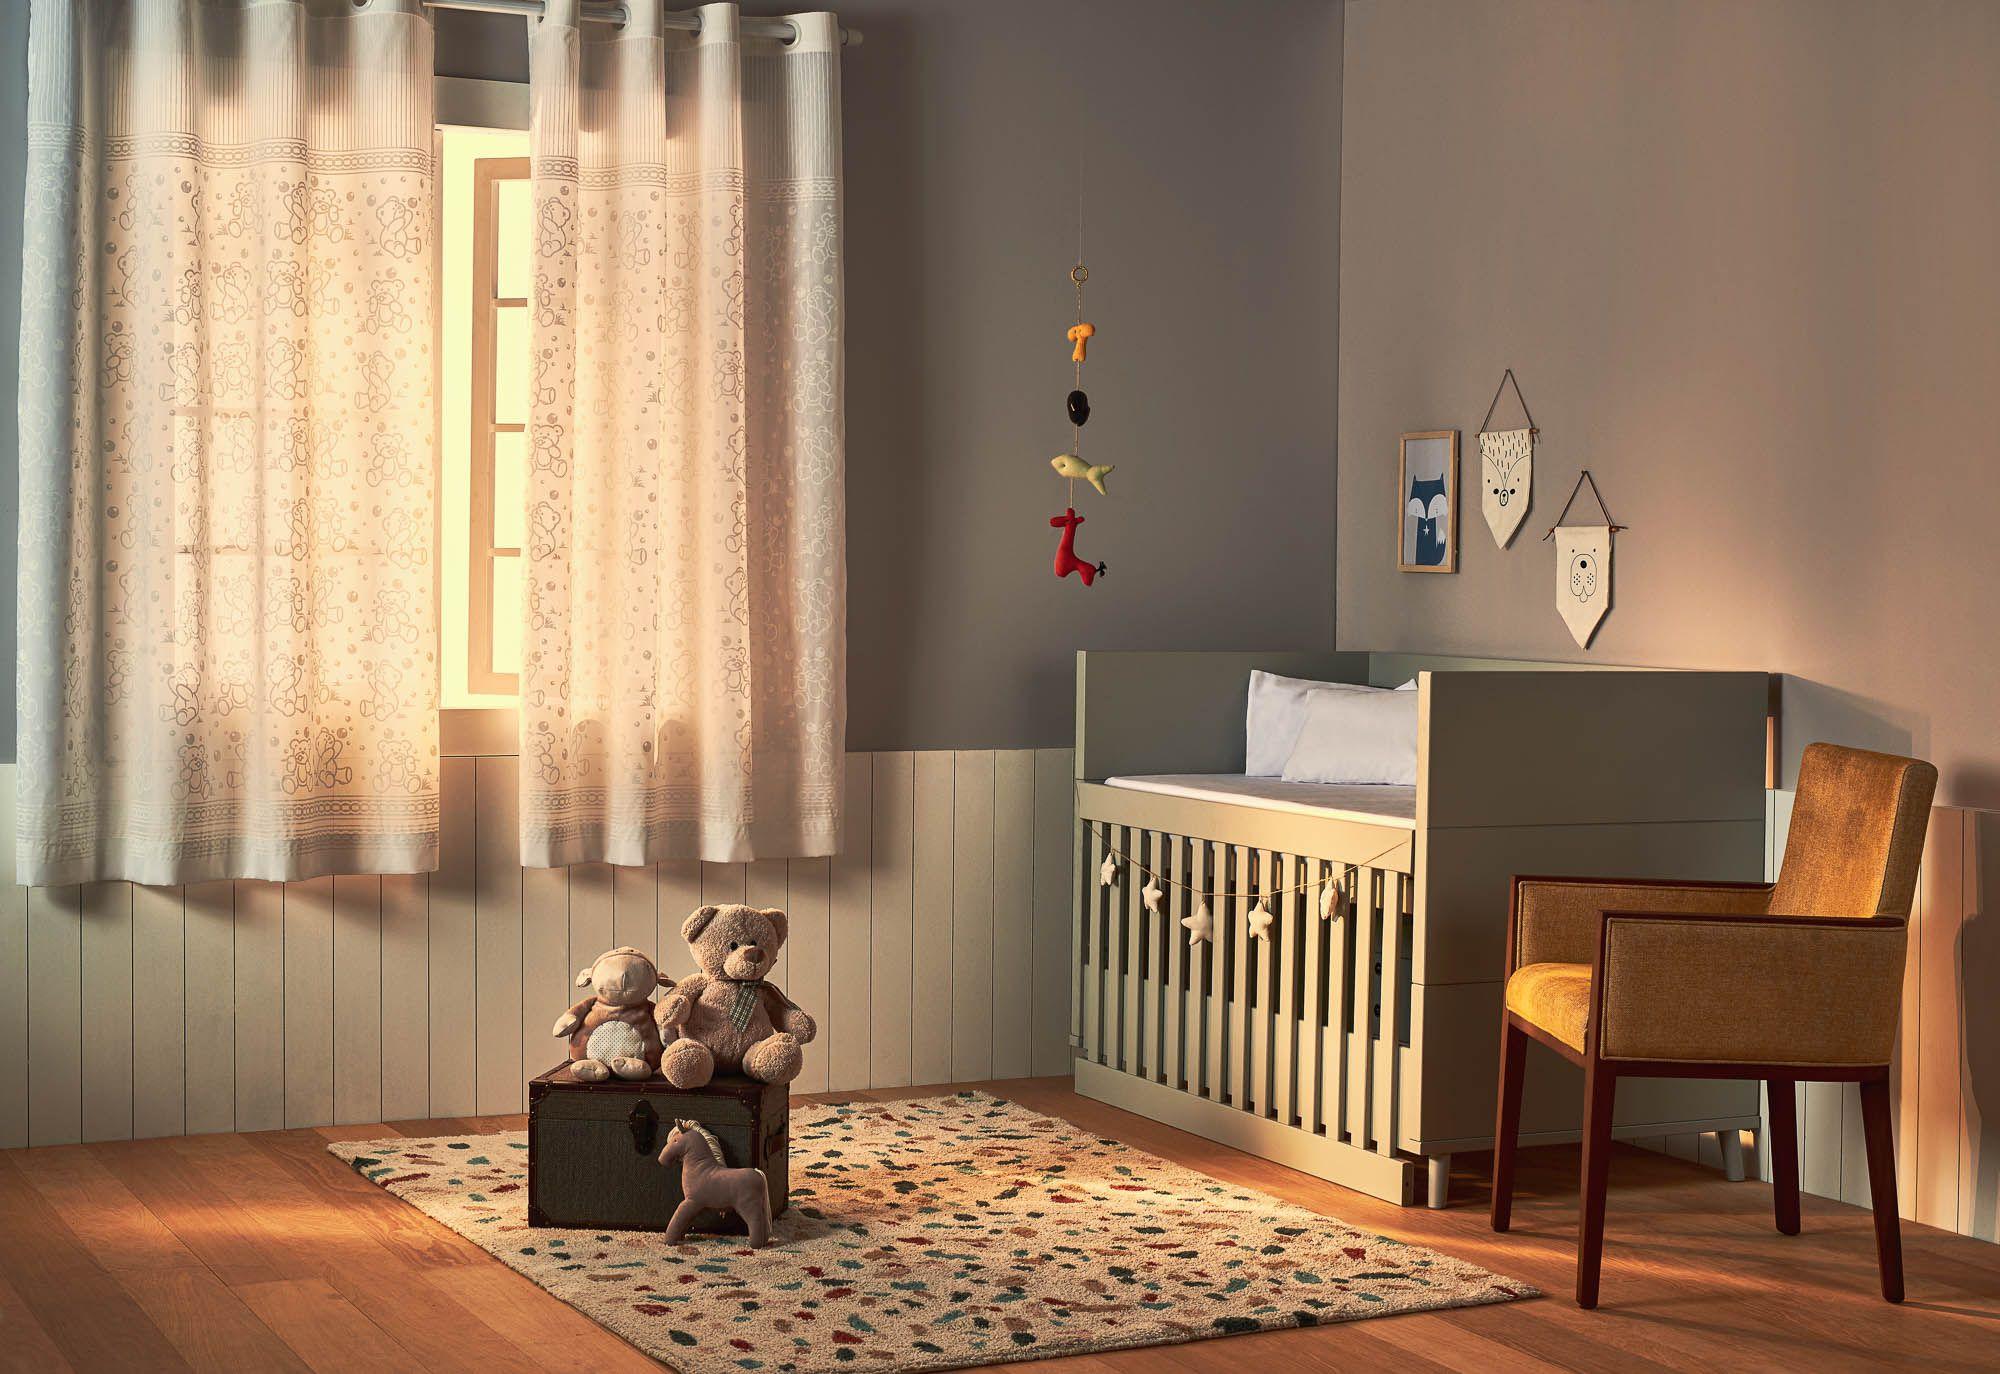 Cortina de quarto baby teddy santista 94% poliester 6% algodão 2,80mt largura x 1,80mt altura